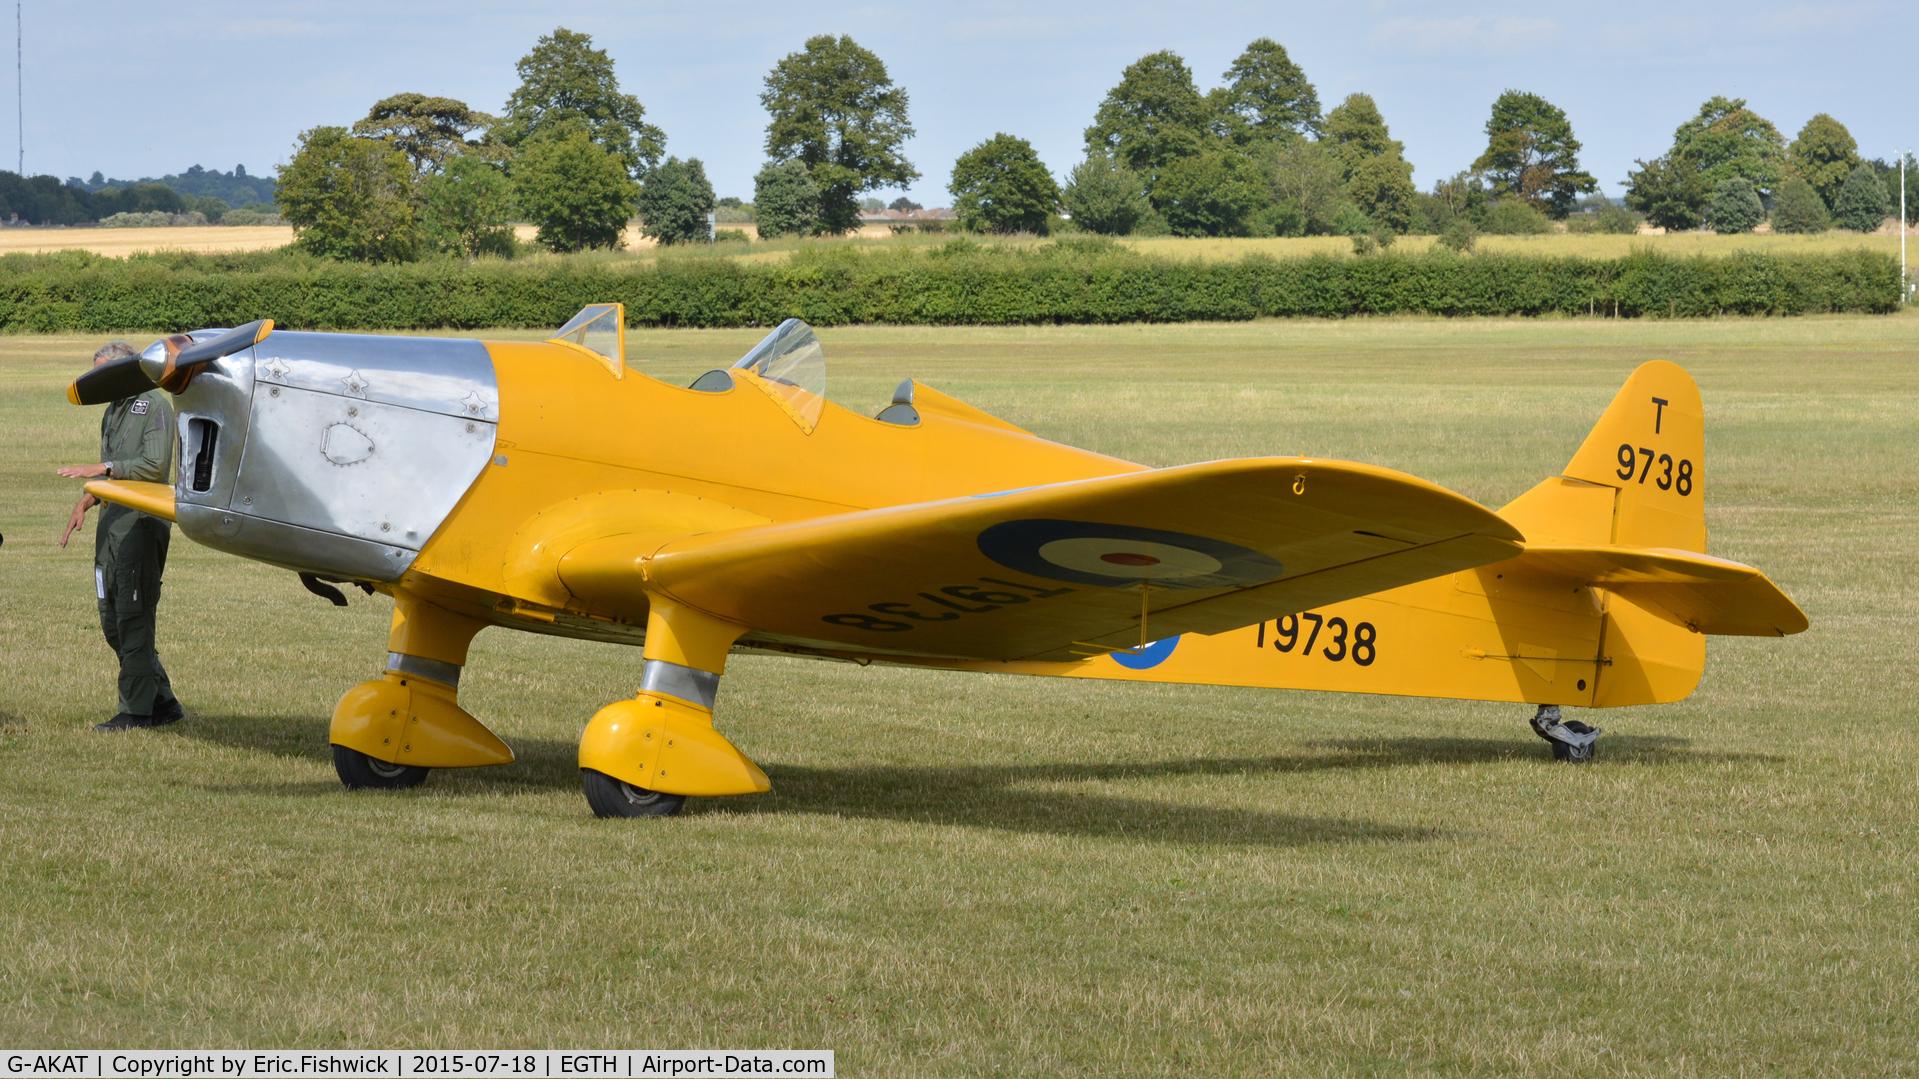 G-AKAT, 1940 Miles M14A Hawk Trainer 3 C/N 2005, 3. T9738 at Shuttleworth Best of British Airshow, July 2015.